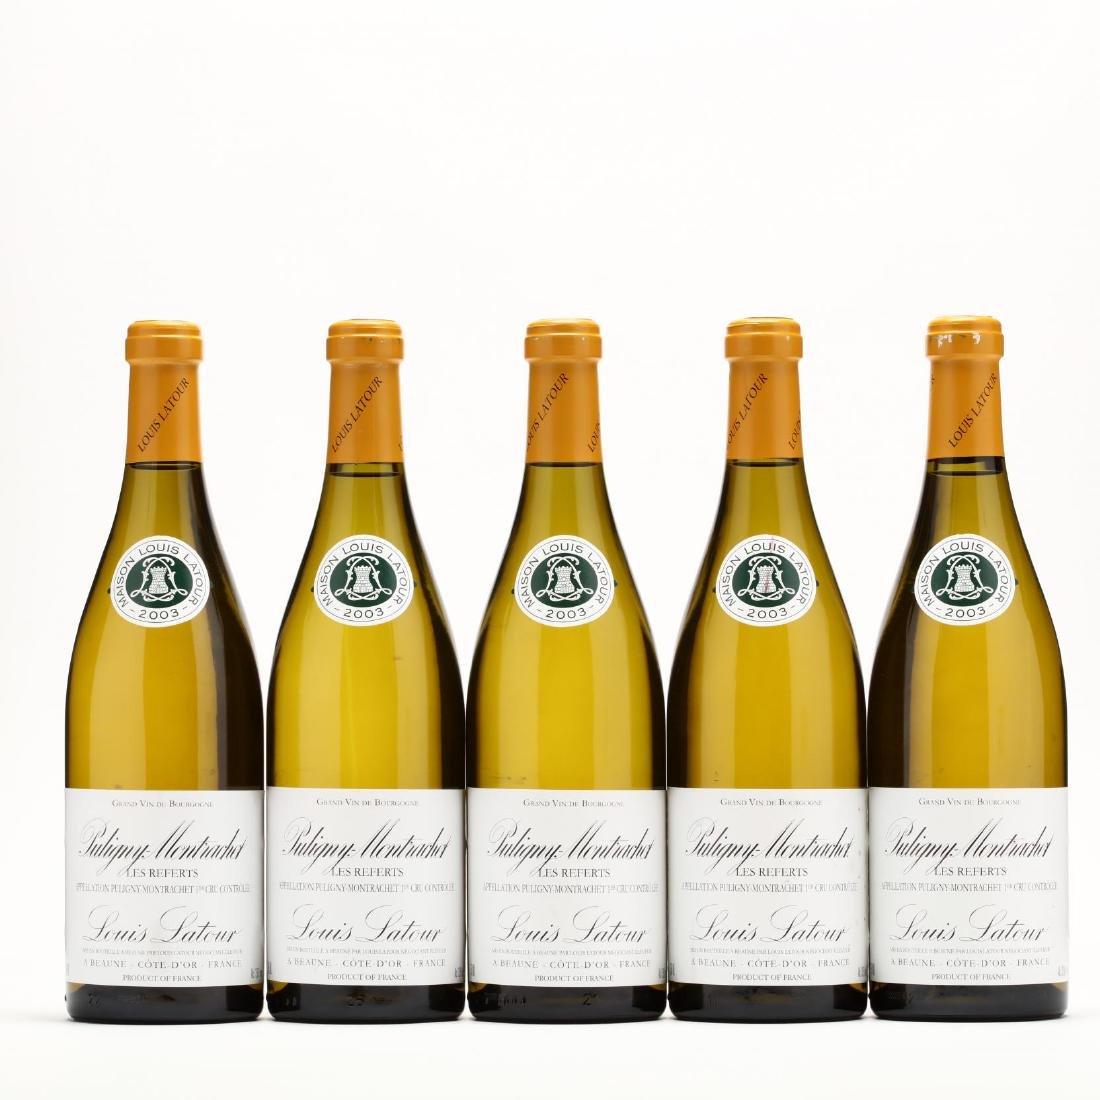 Puligny Montrachet - Vintage 2003